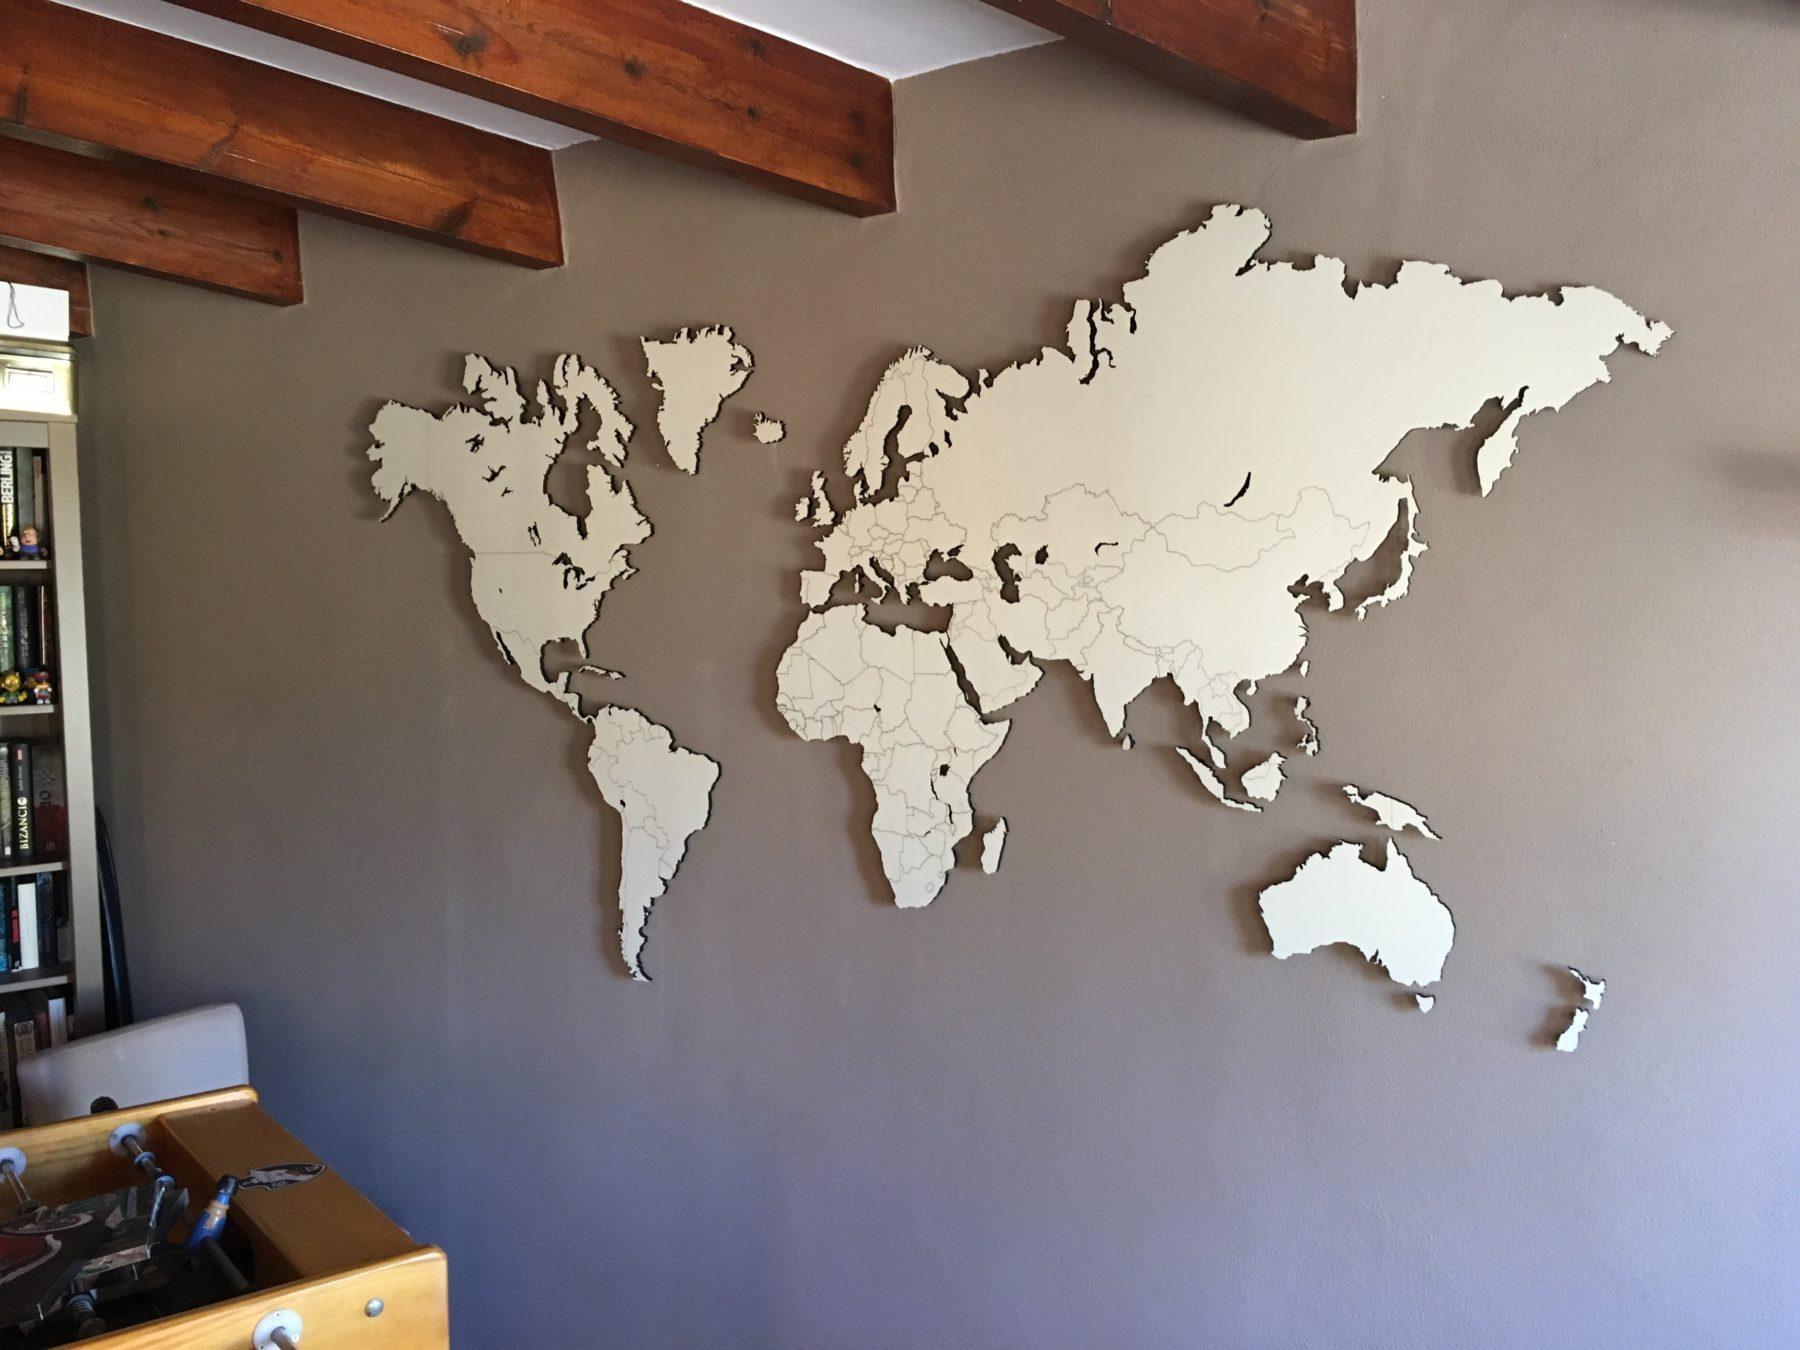 Populieren wereldkaart